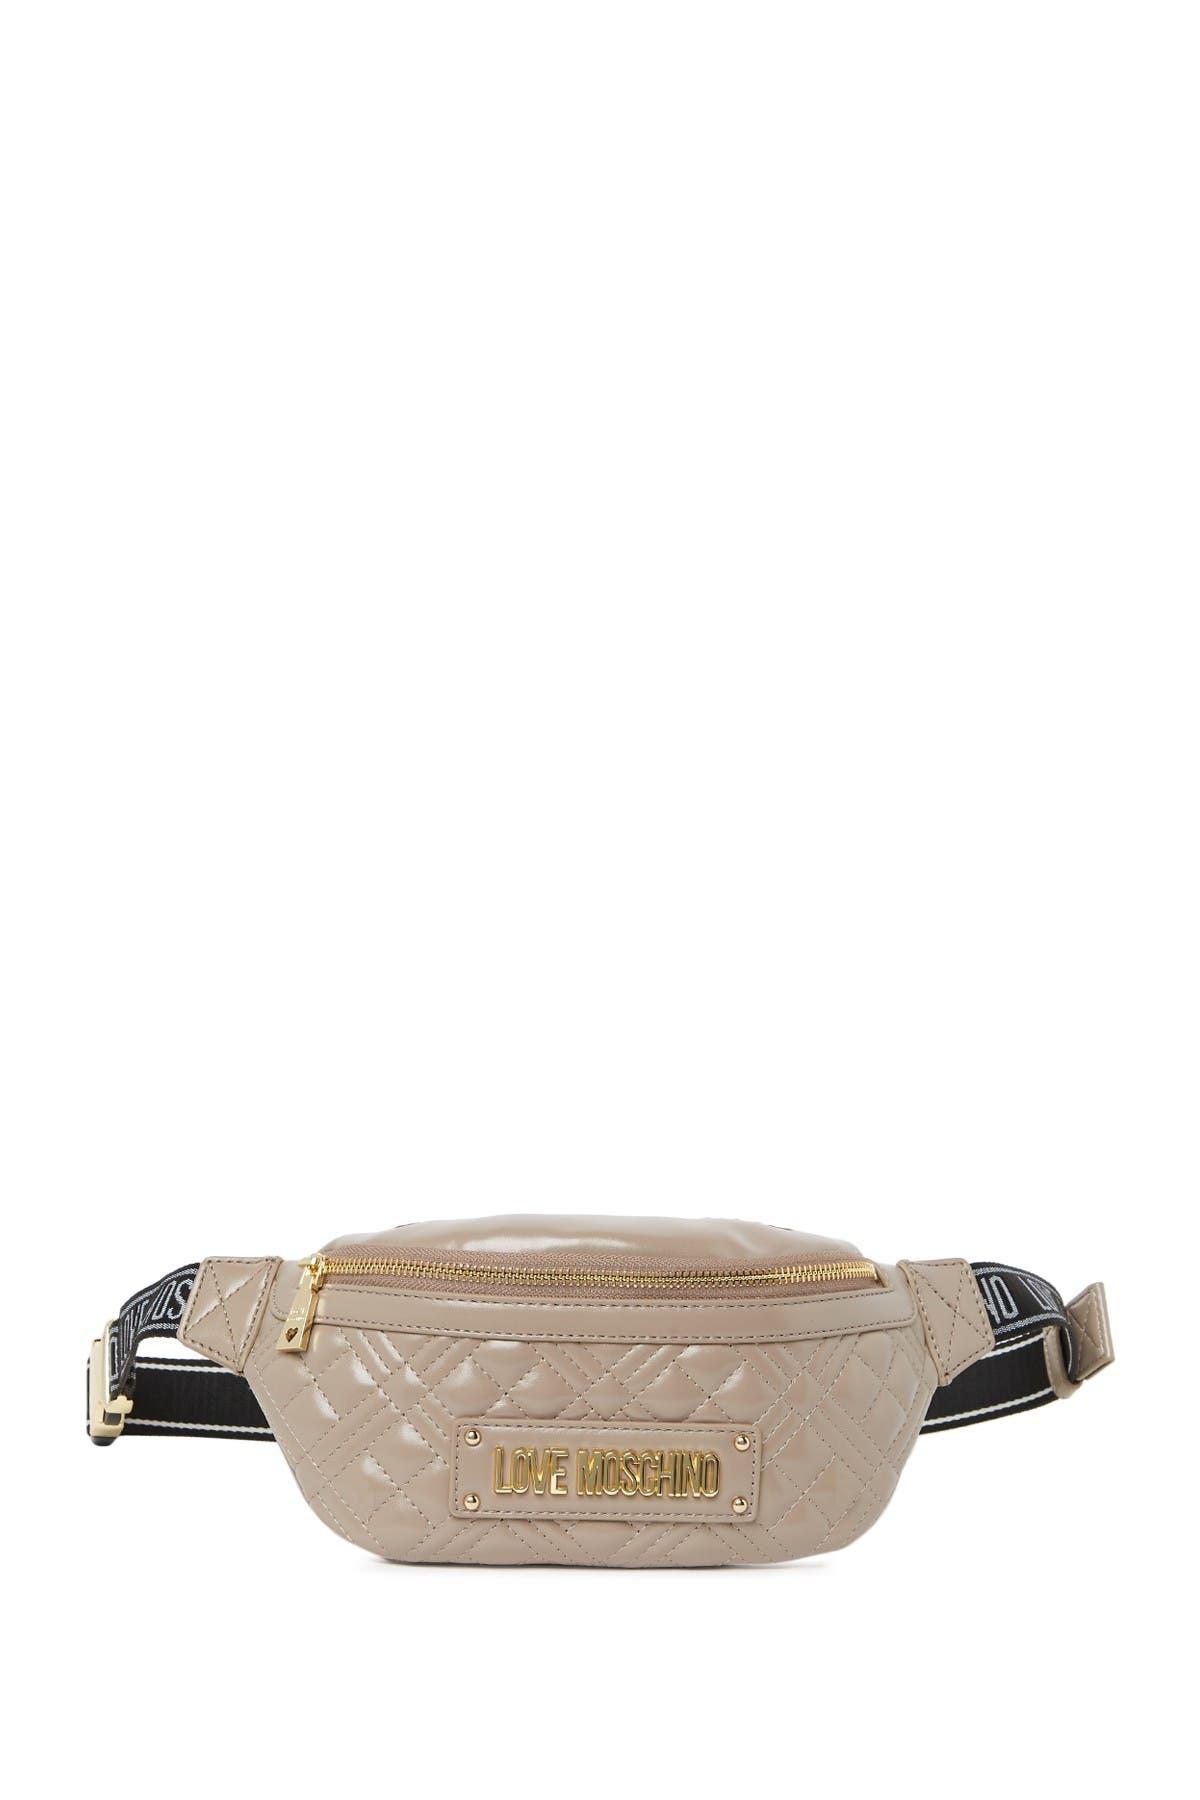 Love Moschino Belt bags BORSA QUILTED NAPPA GRIGIO BELT BAG